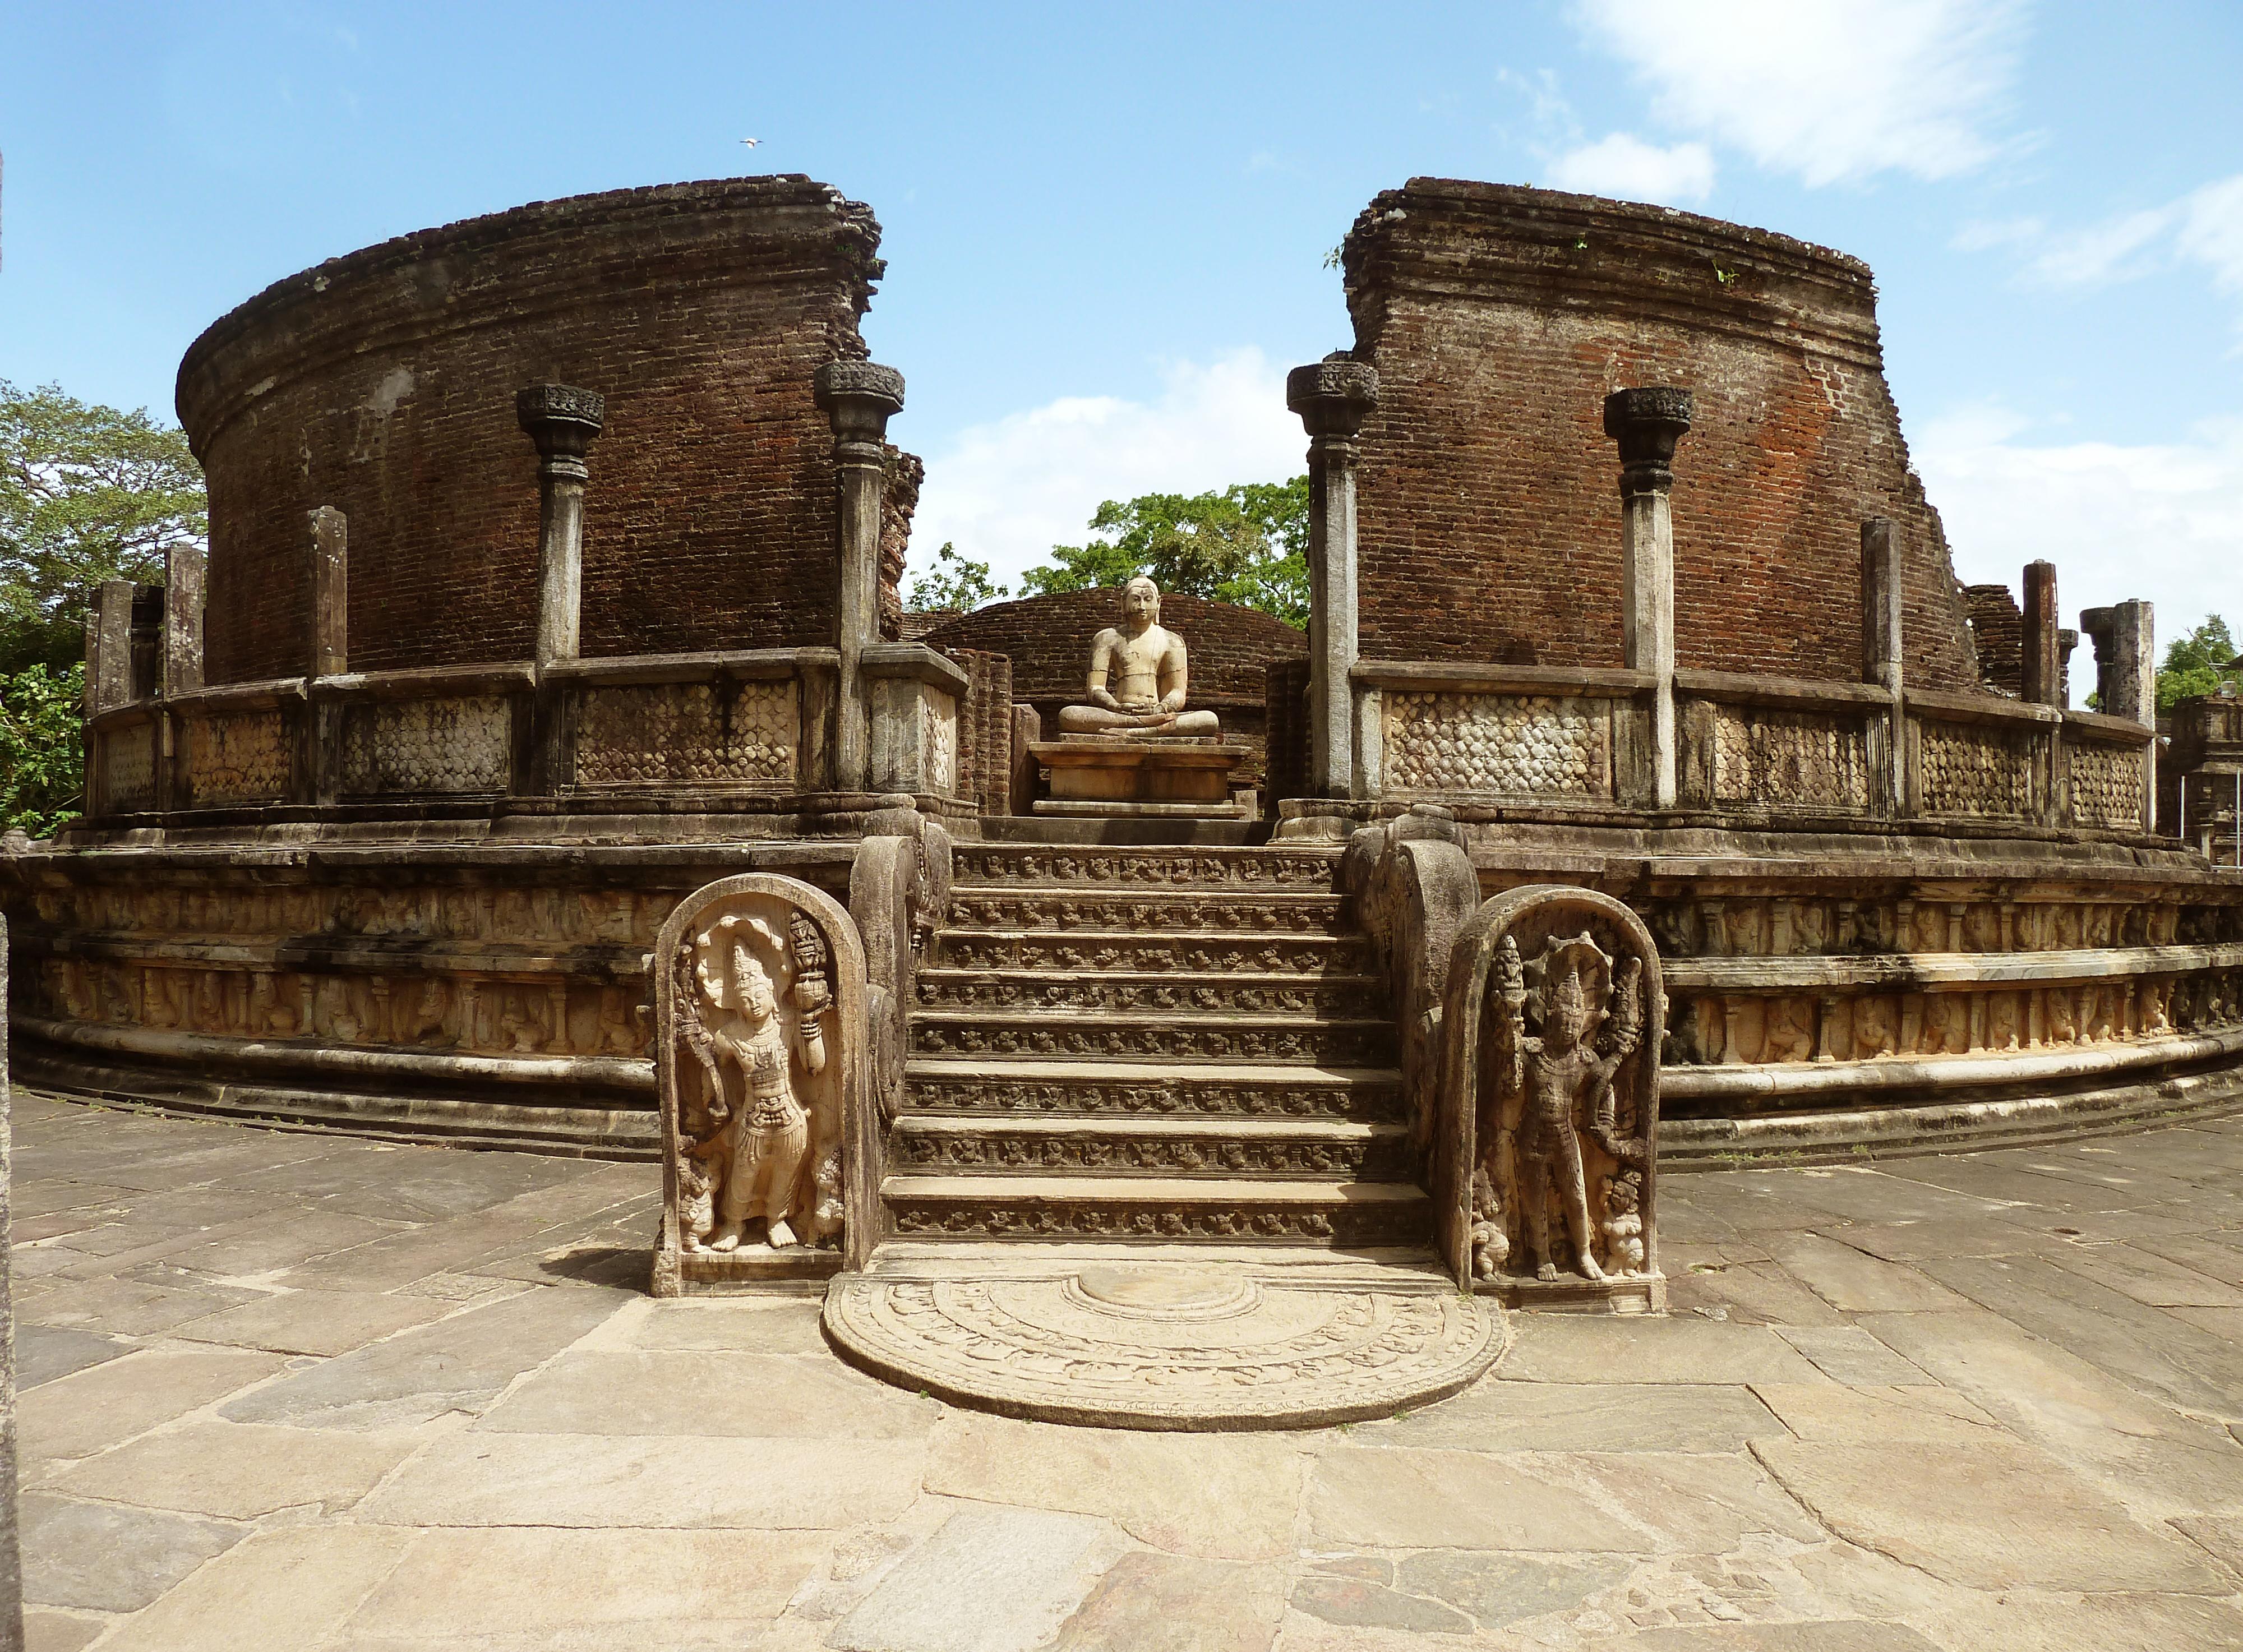 Polonnaruwa Sri Lanka  City pictures : Hatadage Monument, Quadrangle, Polonnaruwa, Sri Lanka